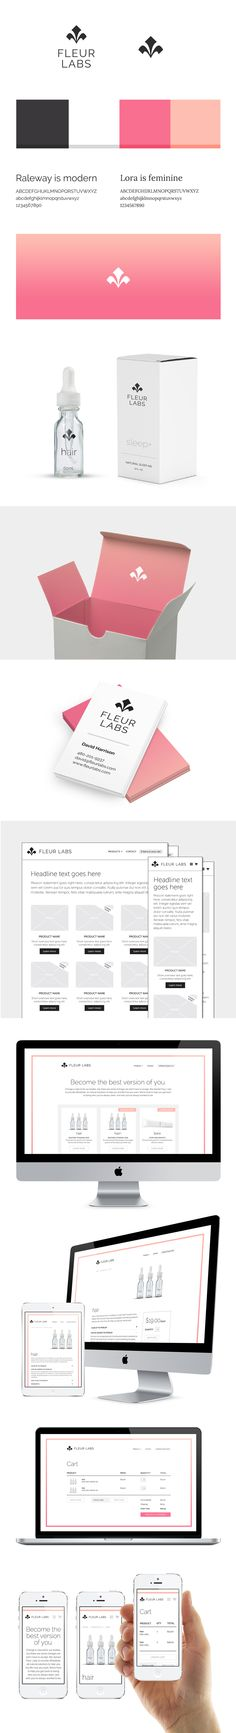 FleurLabs brand design by Strong Design #branding #logo #webdesign